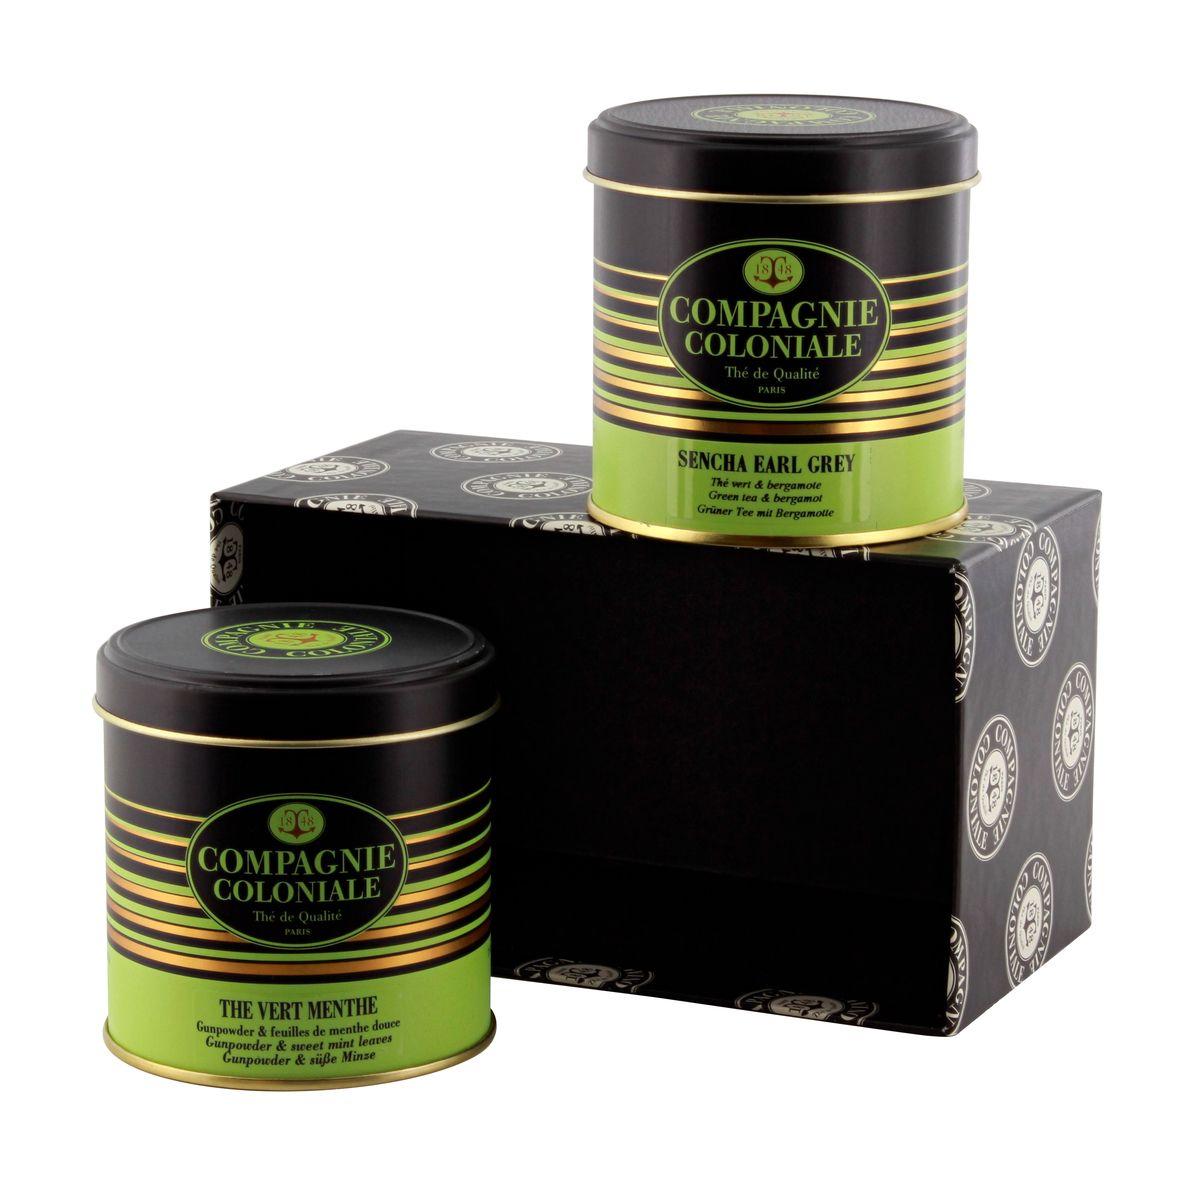 Coffret boîtes de luxe : sencha earl Grey / thé vert menthe - Compagnie Coloniale